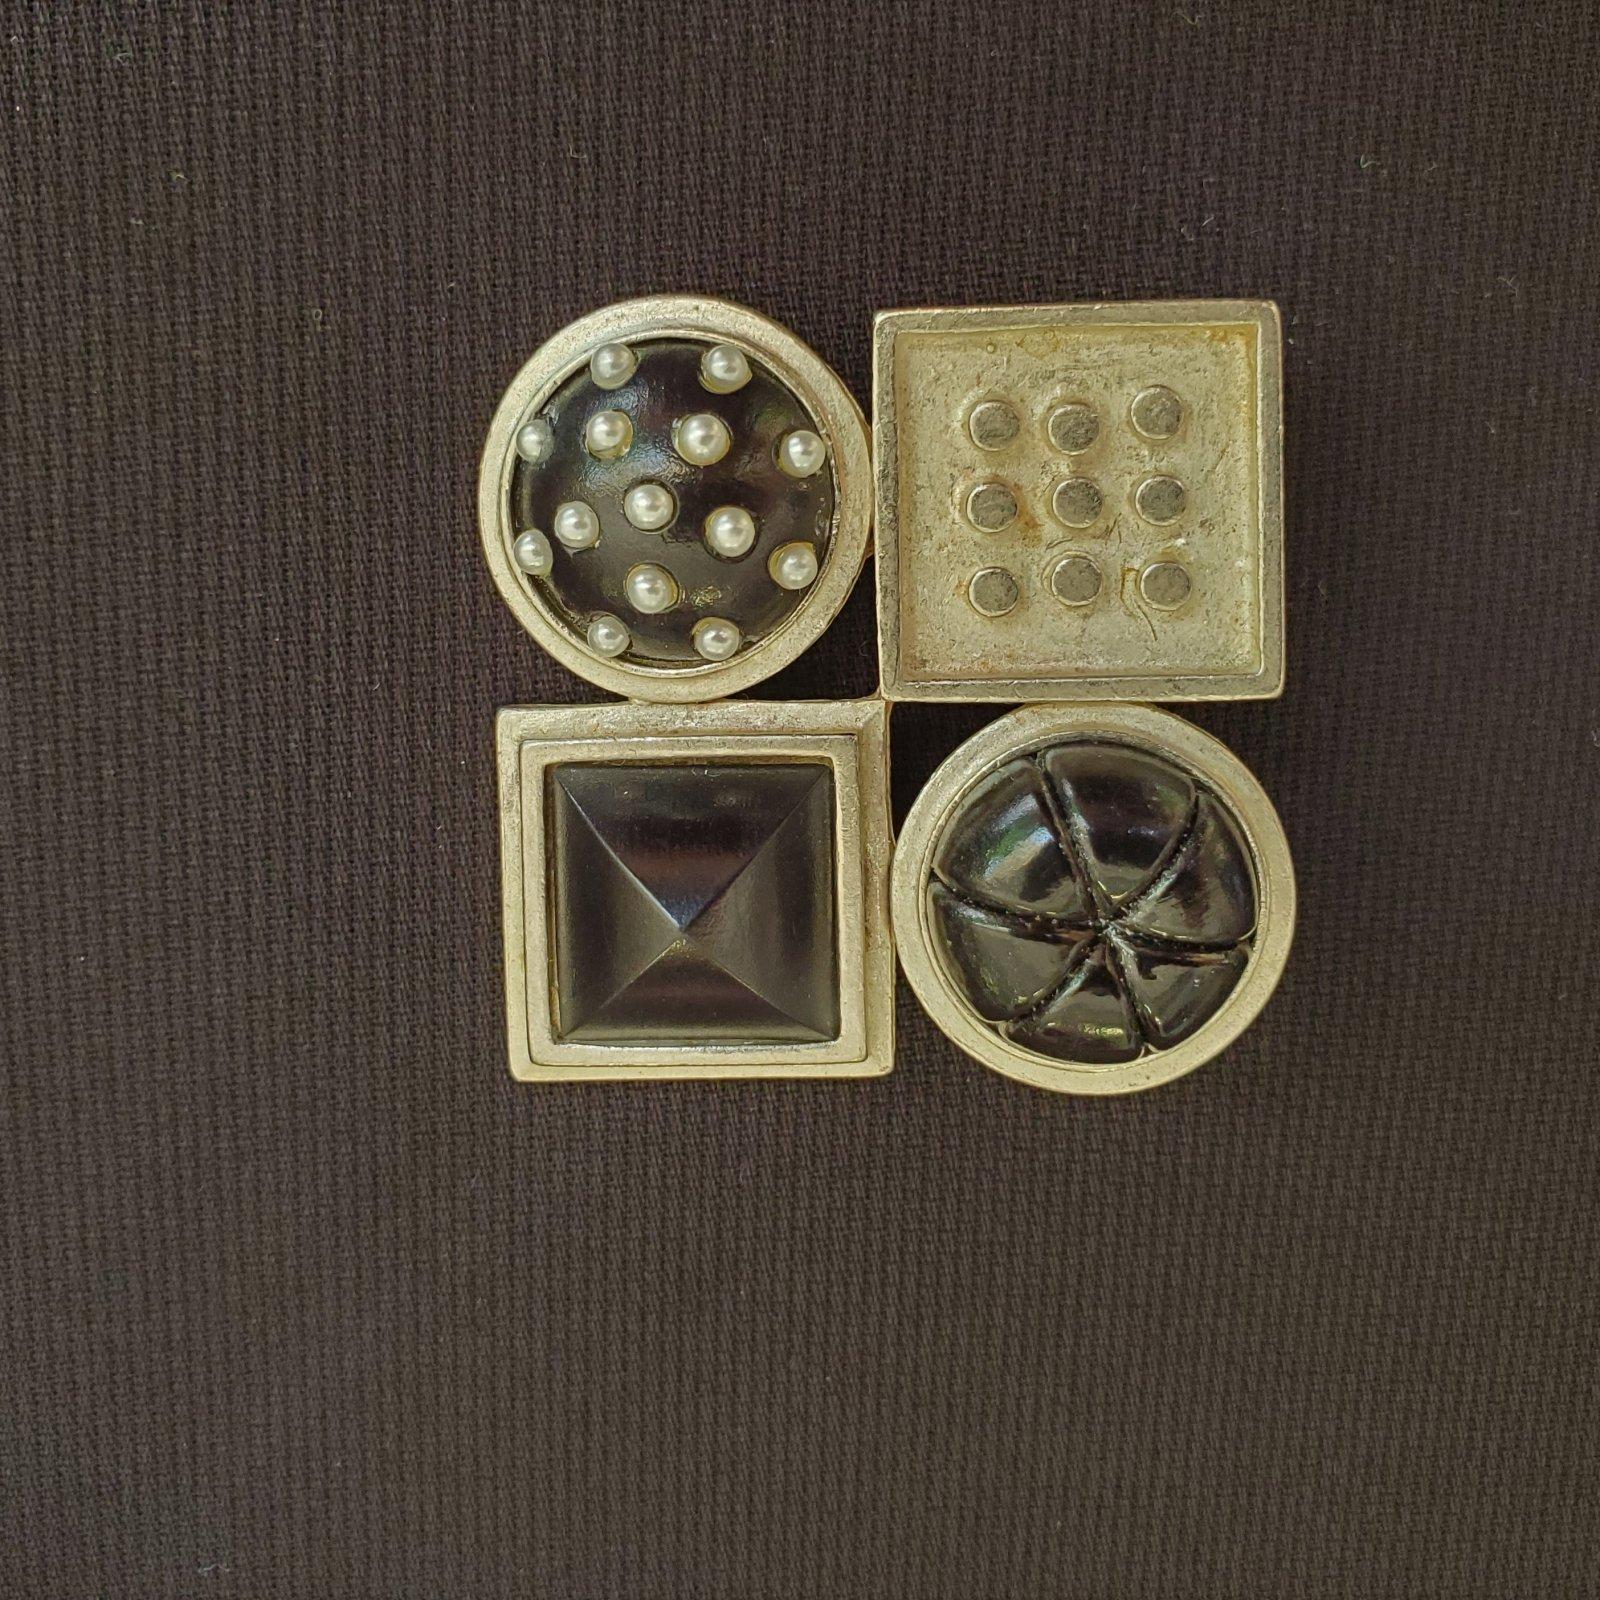 Black and silver pin-NN-010037